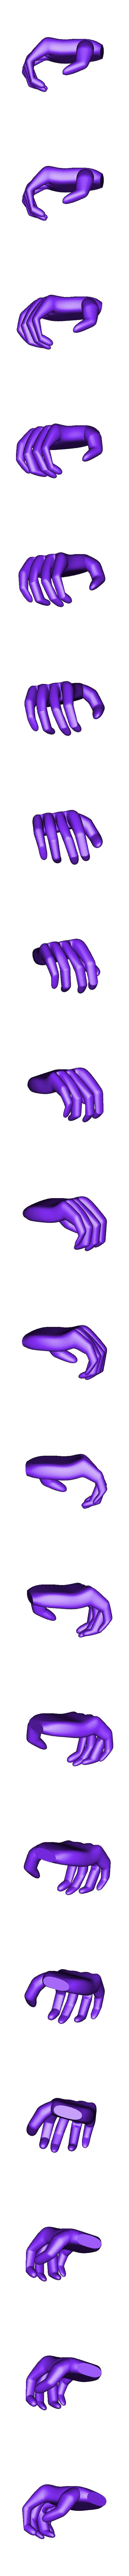 RHand.stl Download STL file Super Witch • 3D print template, amadorcin